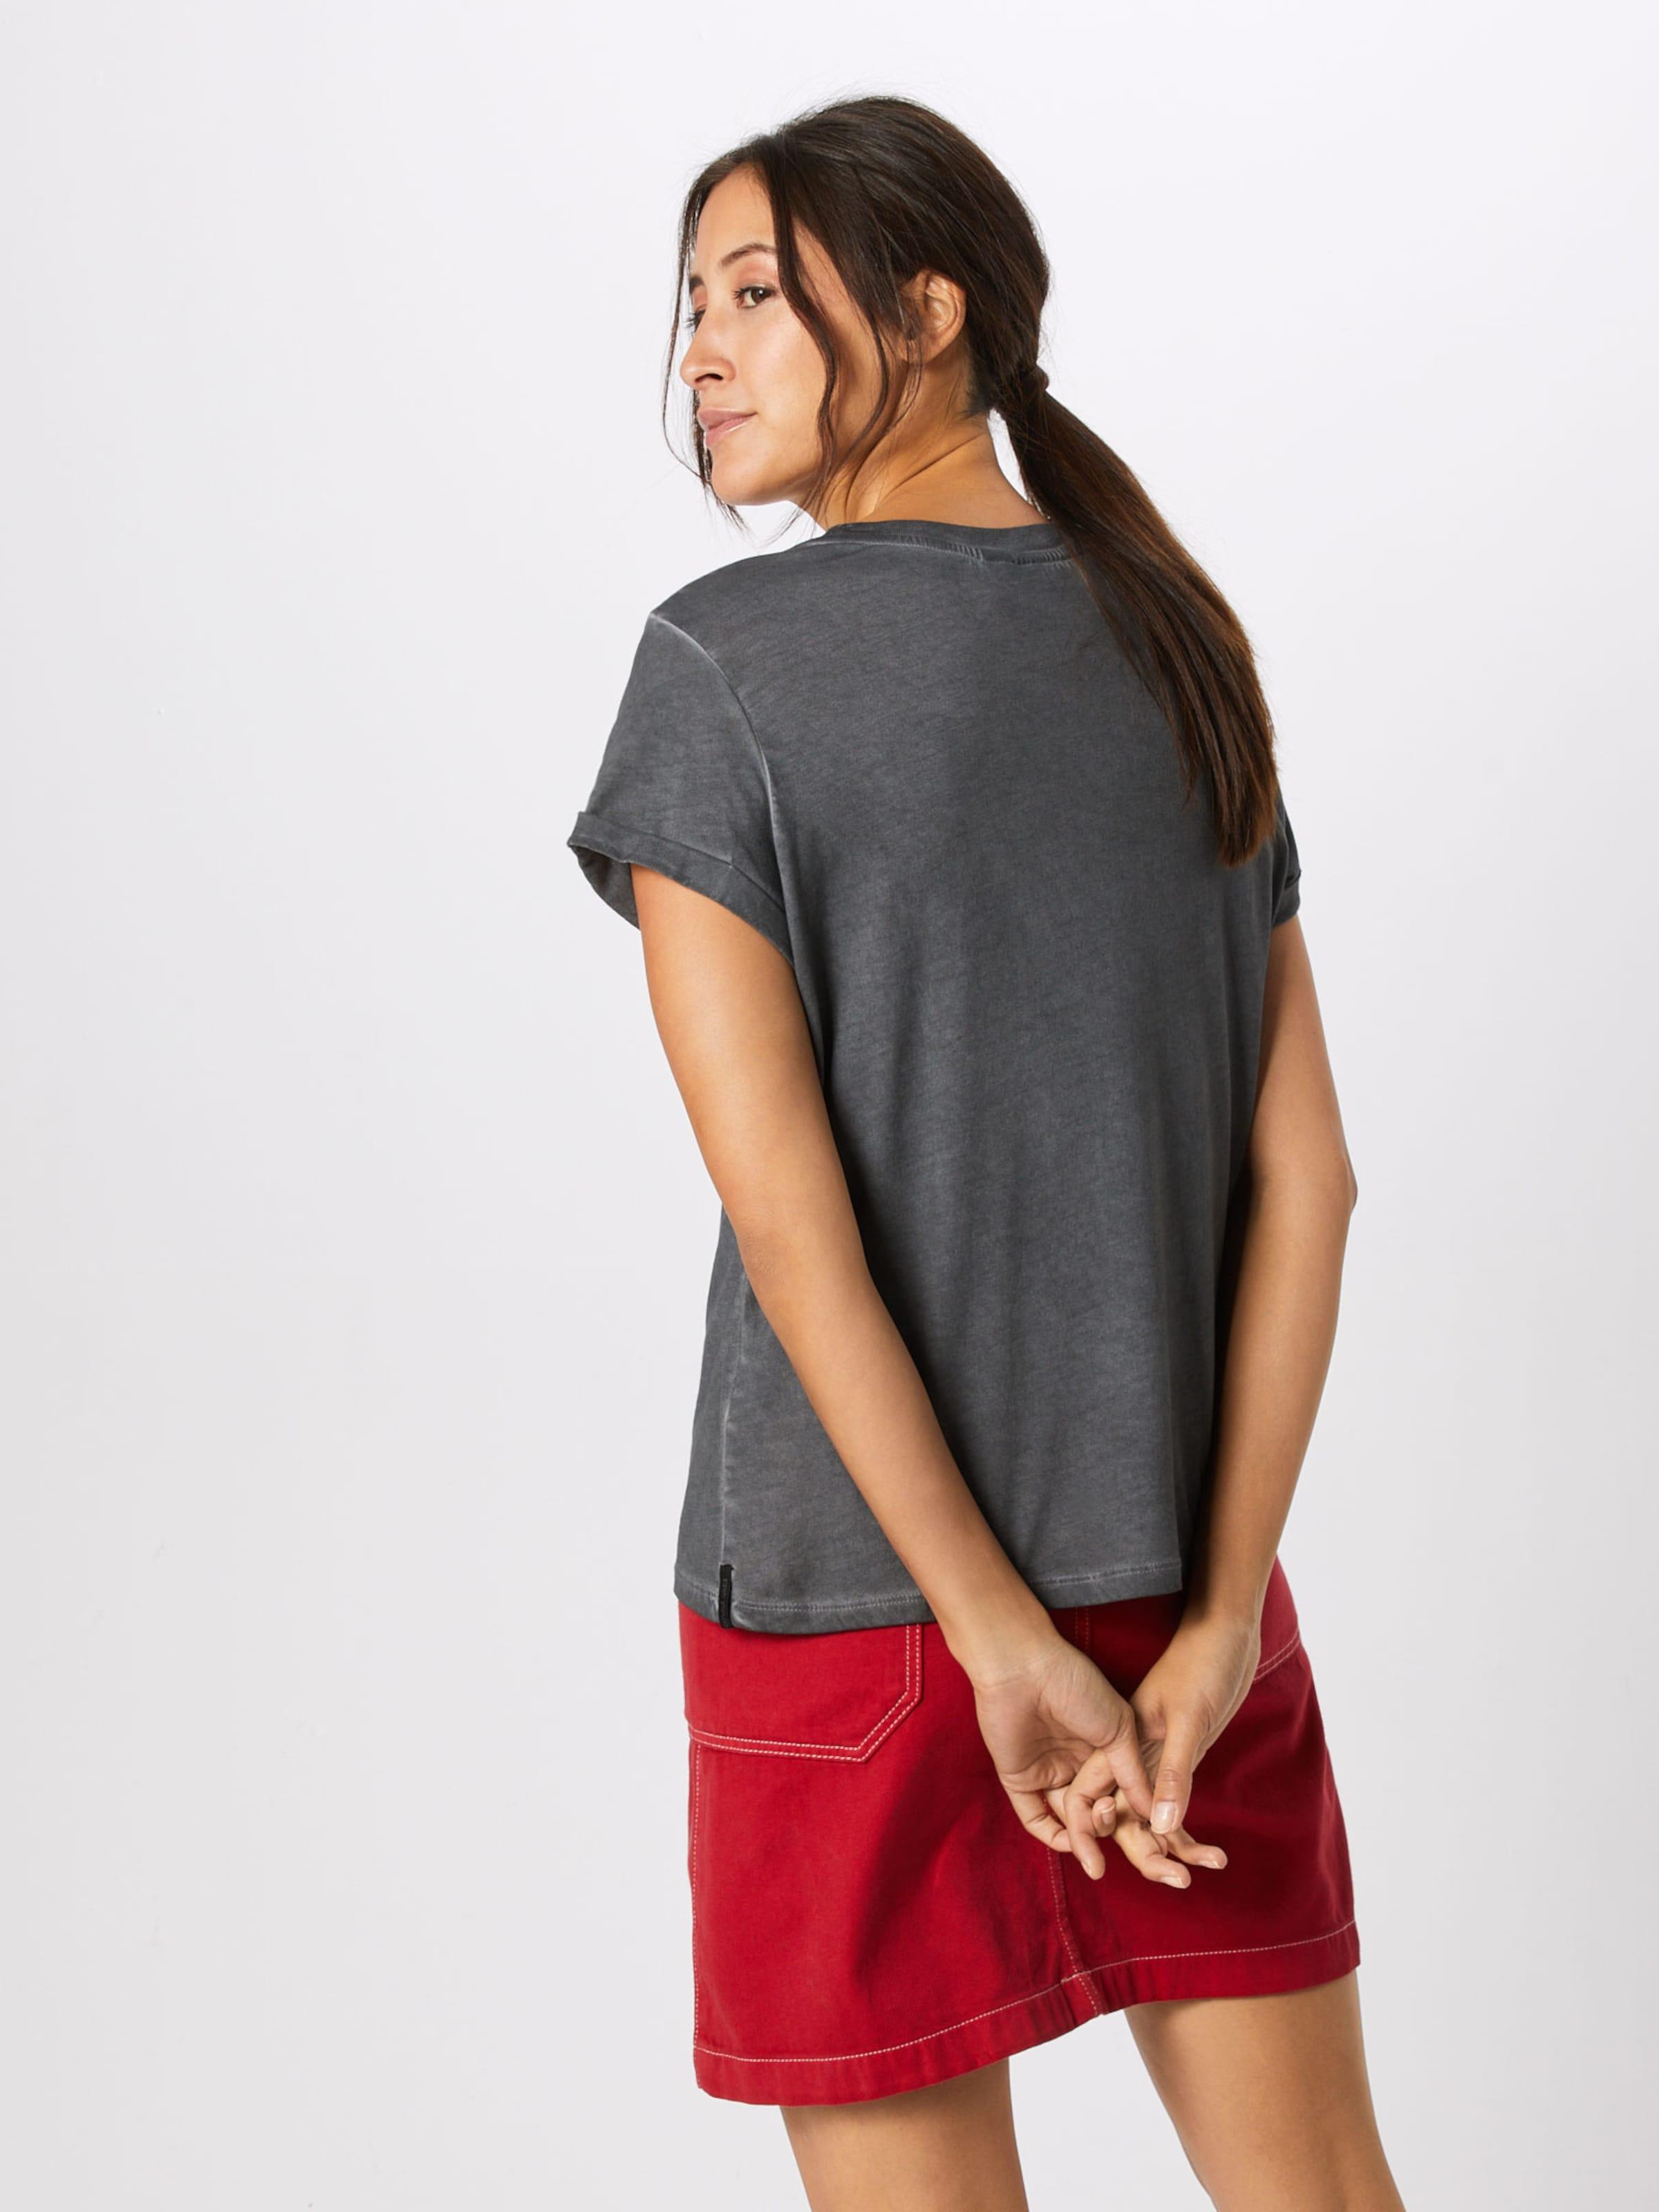 Shirts 's In Catwalk Spring' Anthrazit Junkie xeBordC